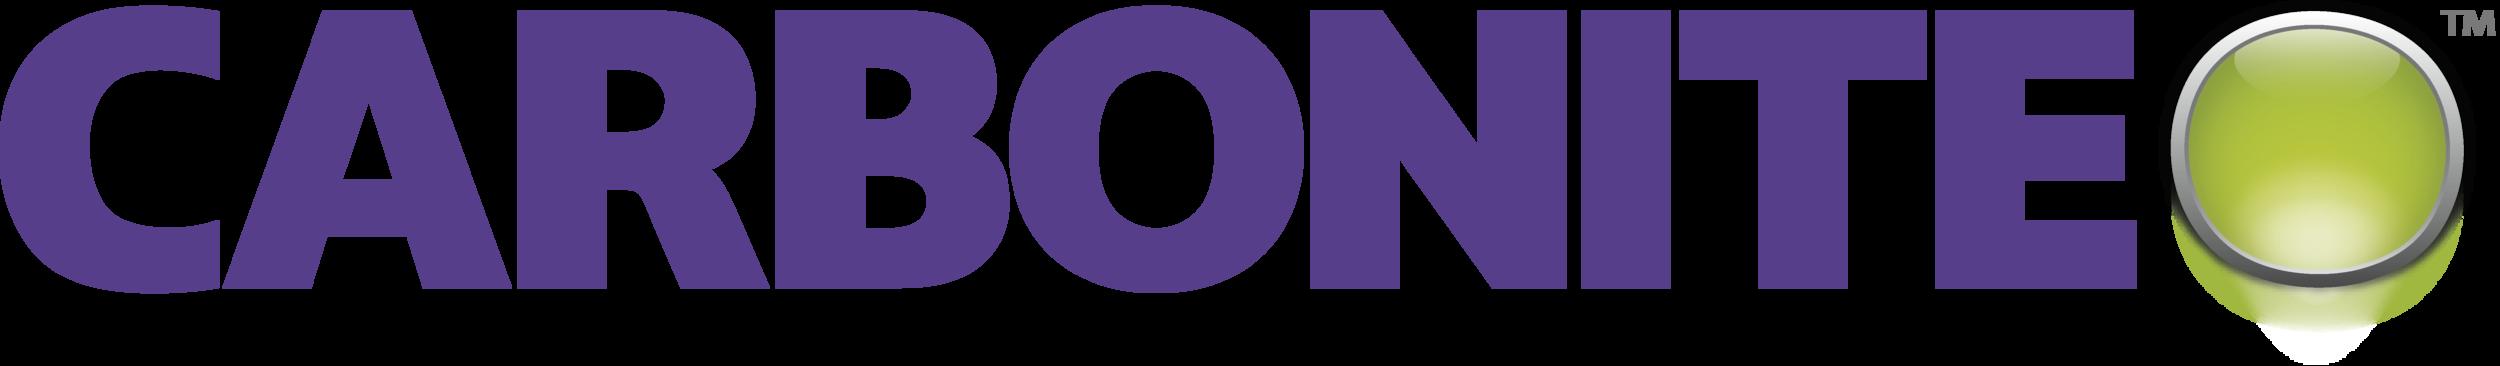 CARBONITE_logo_solo_CMYK_02.22.12.png